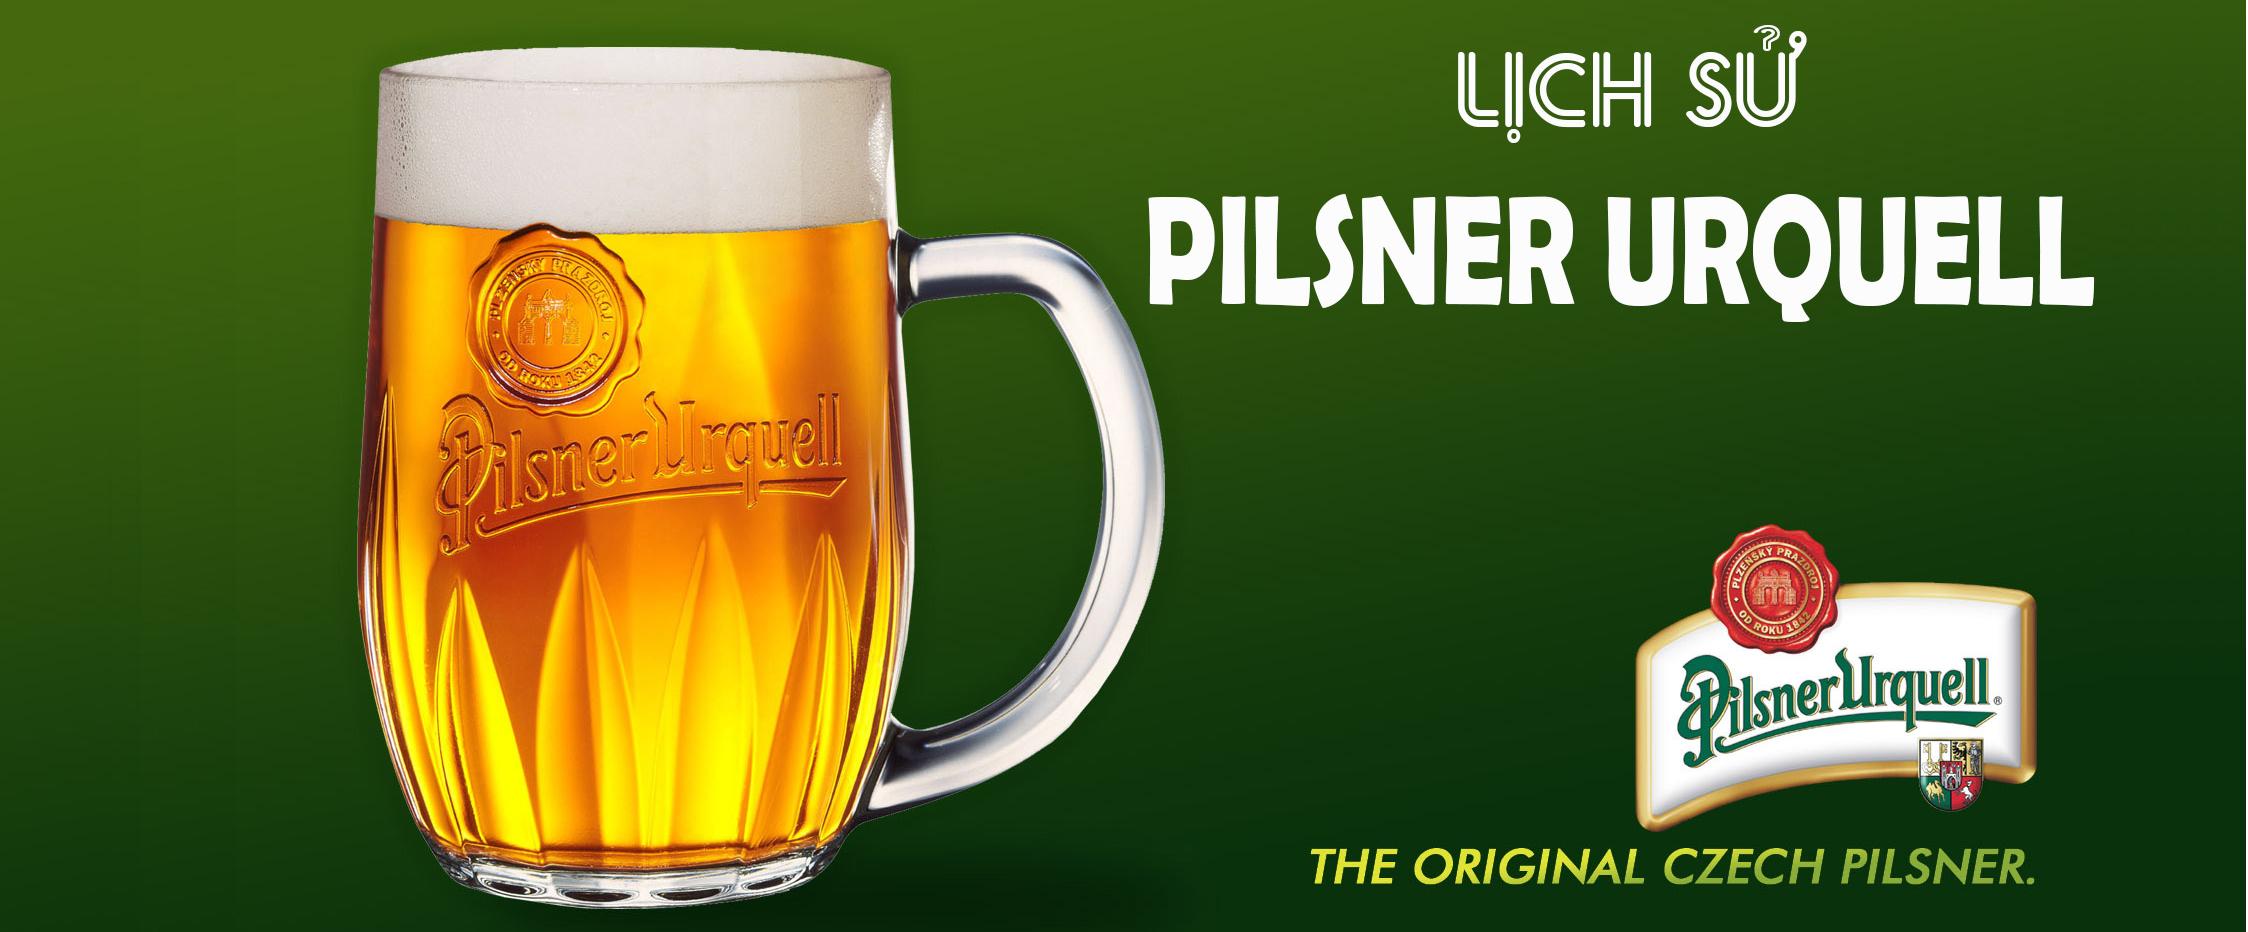 Lịch sử về bia Pilsner Urquell